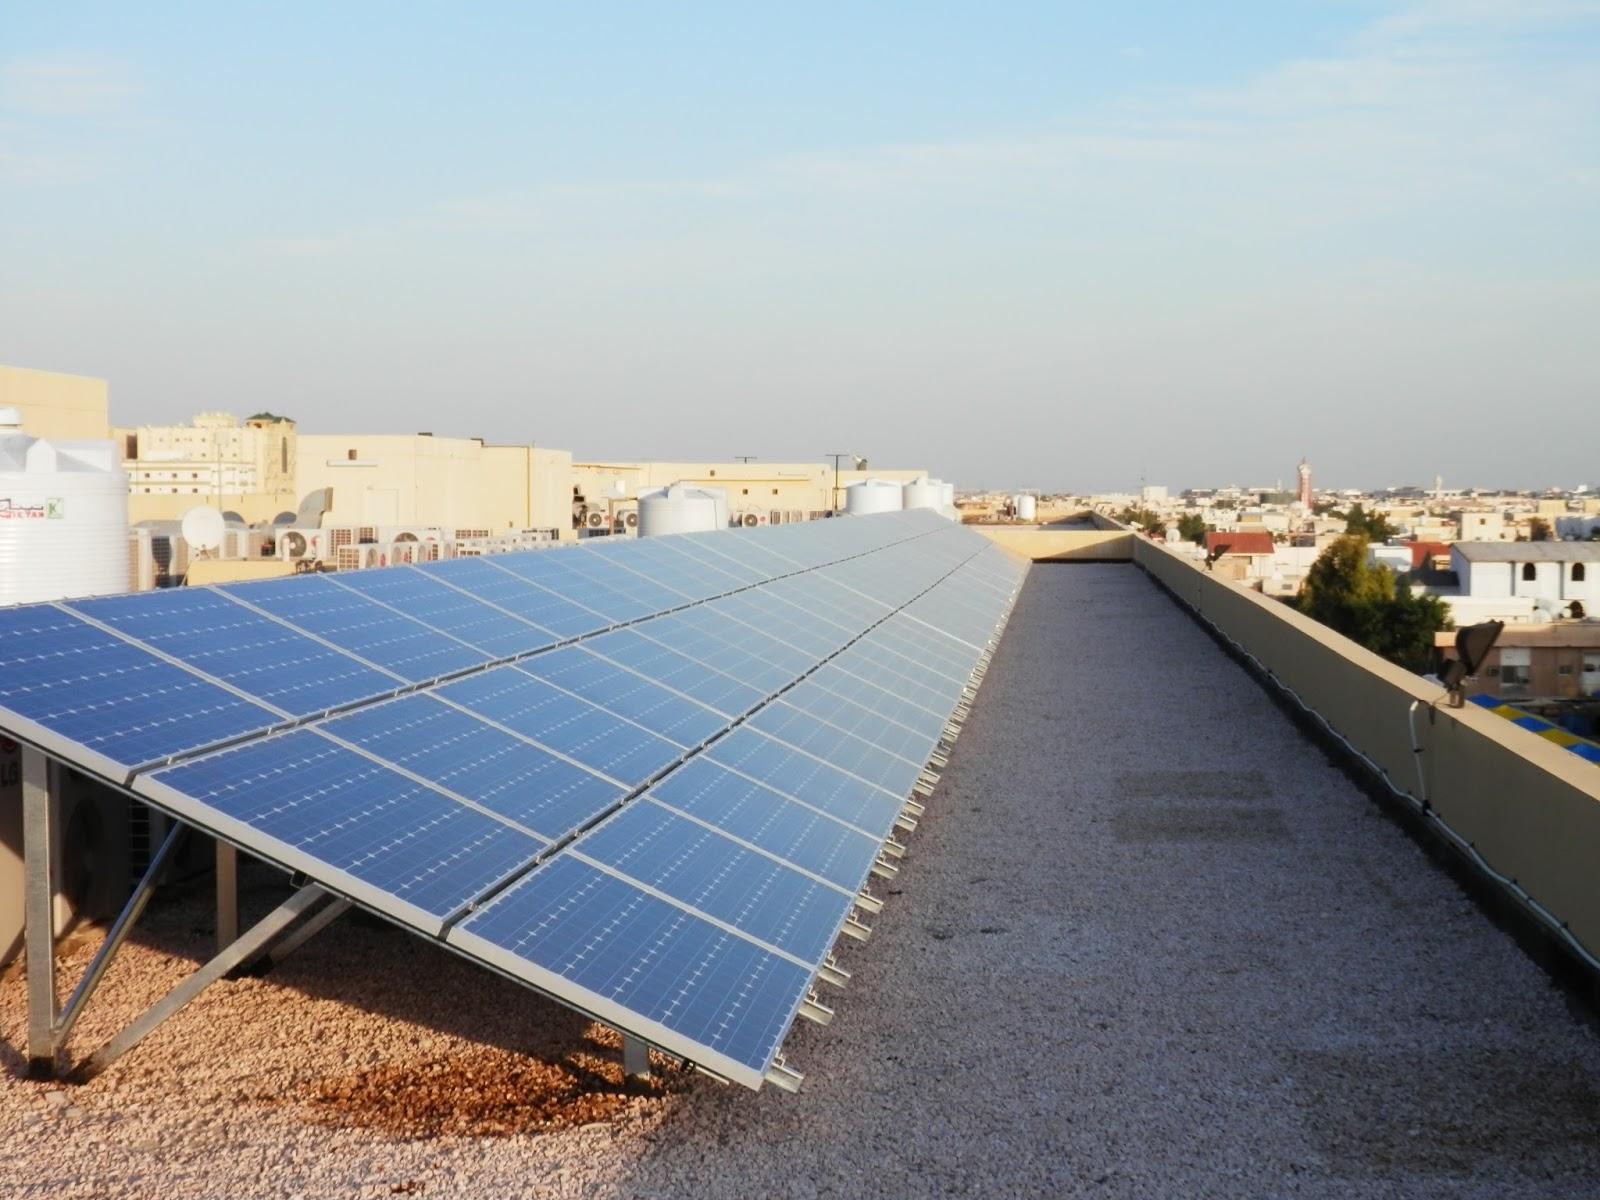 How To Design A Solar Pv System - Home solar power system design